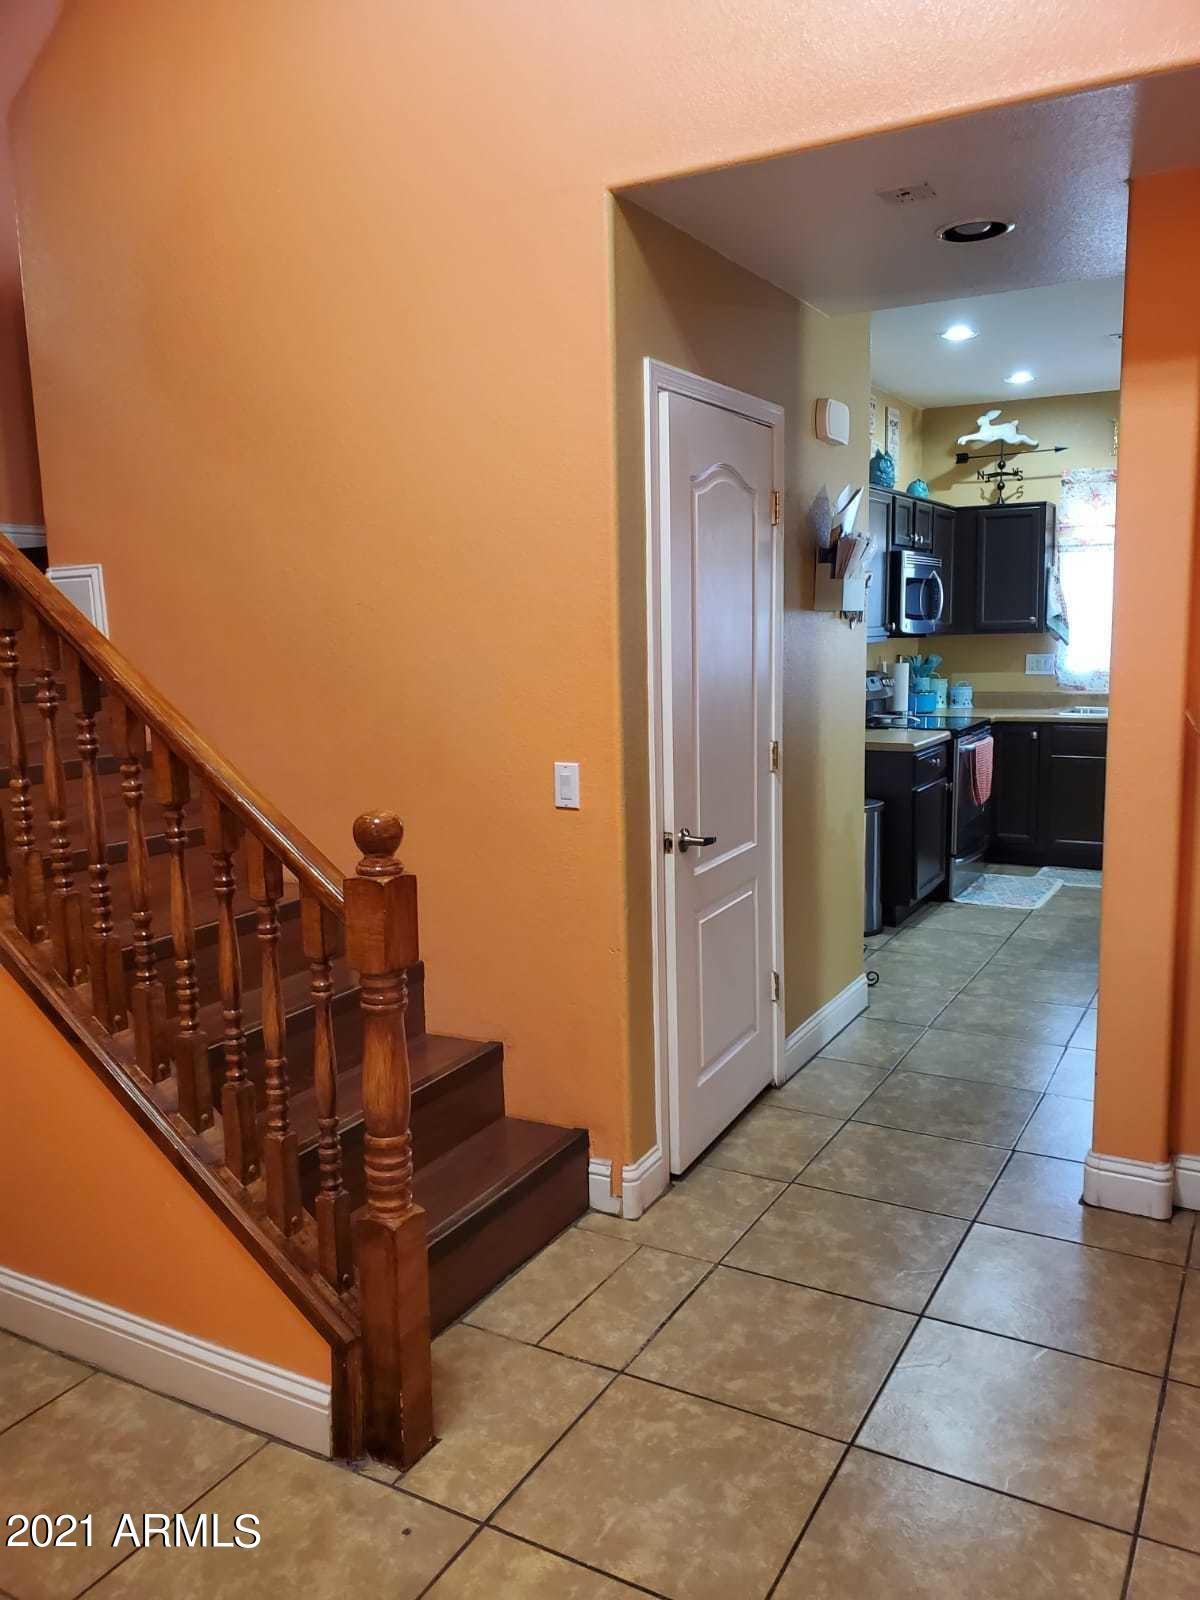 Photo of 11645 W WESTERN Avenue, Avondale, AZ 85323 (MLS # 6200565)